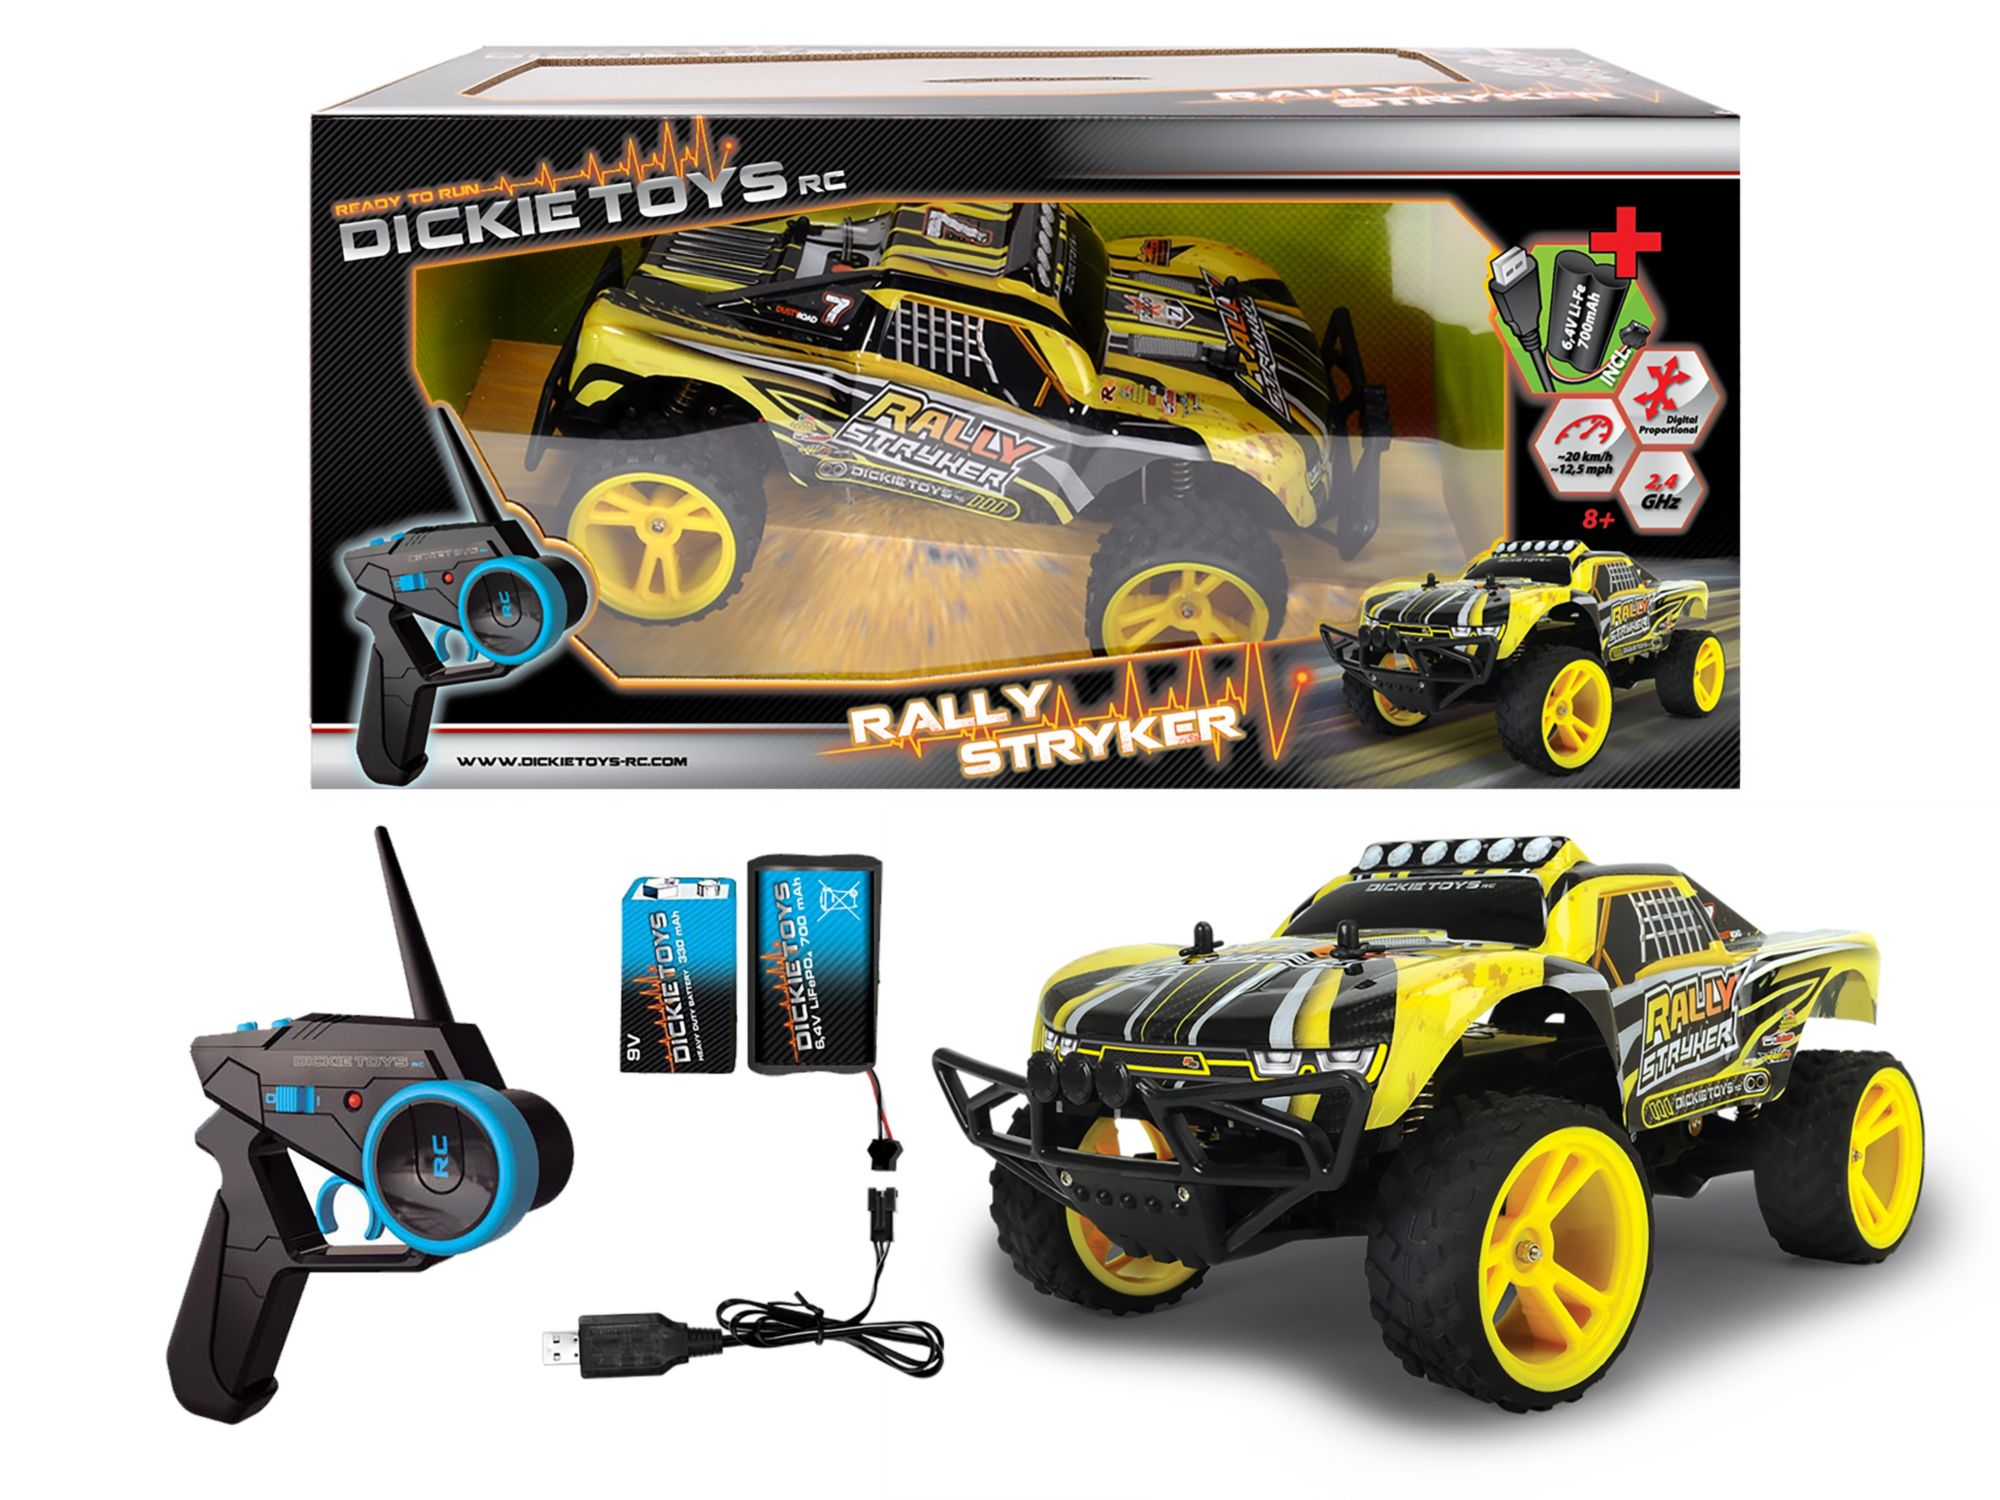 DICKIE TOYS Dickie Toys RC Komplett Set, »Rally Stryker 2,4 GHz 1:12«